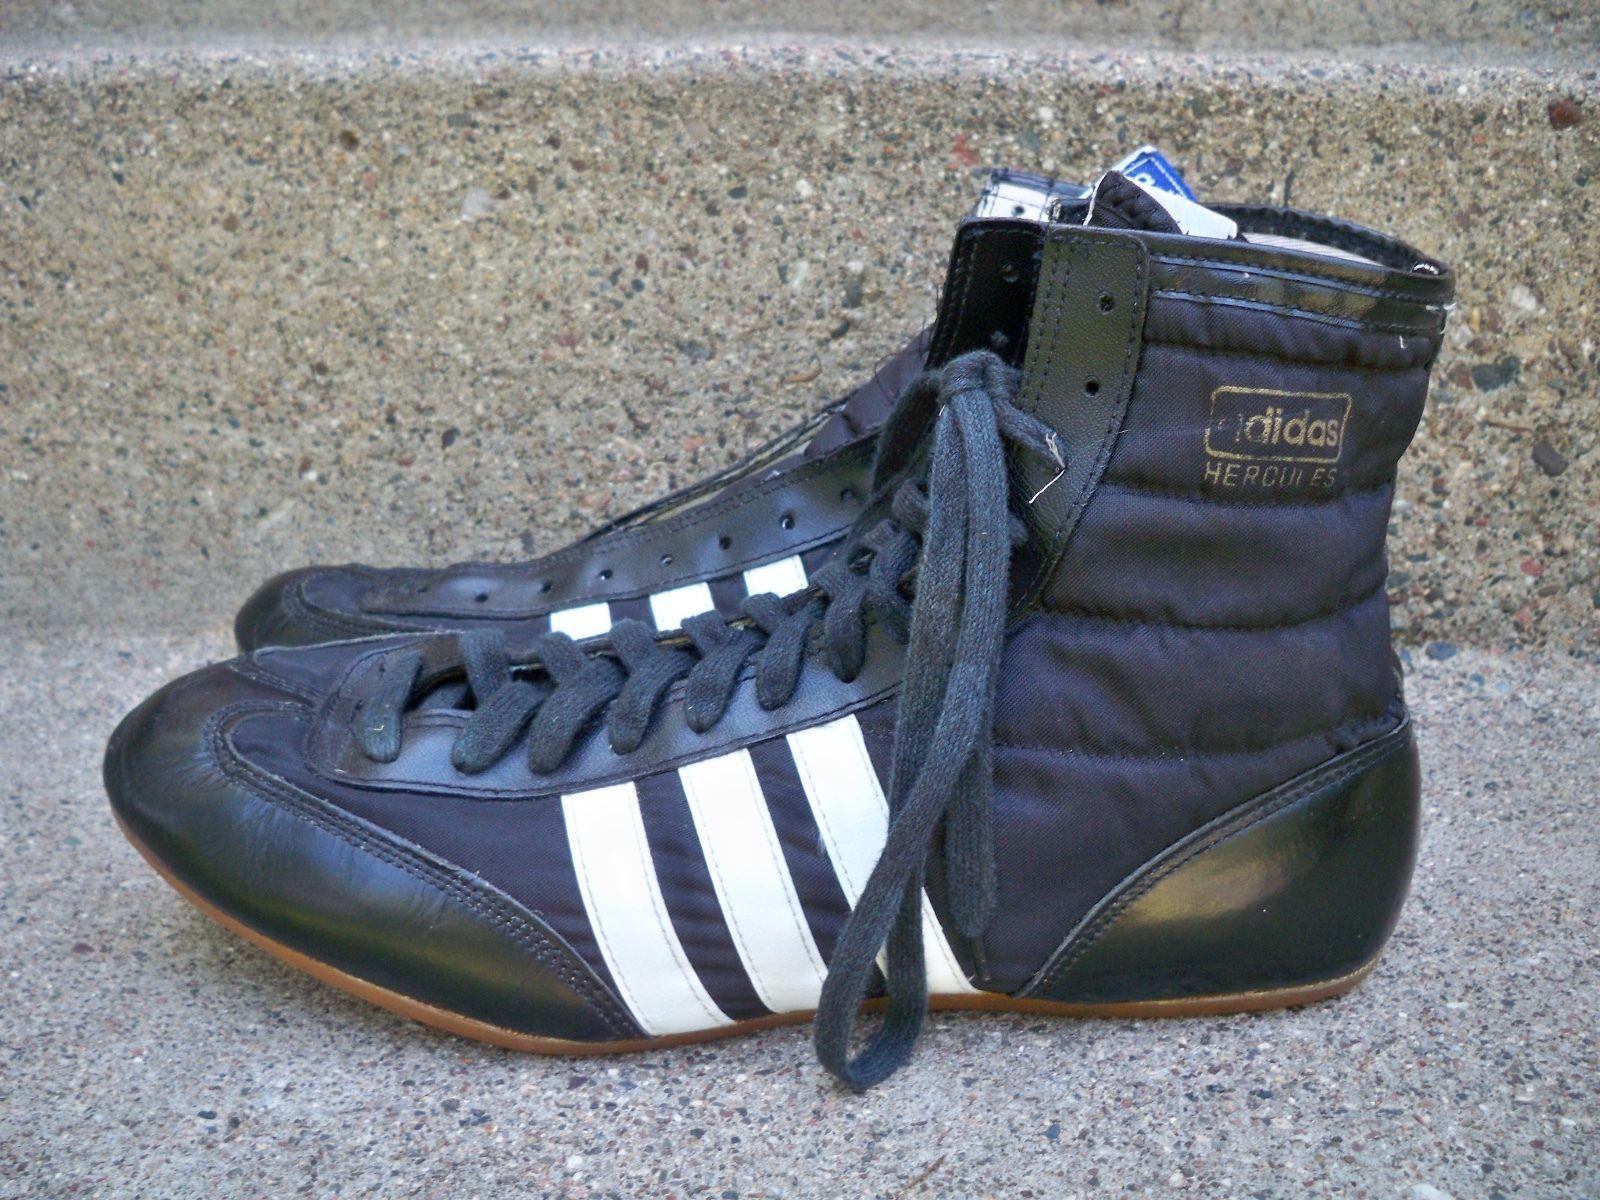 Adidas Hercules wrestling boots.